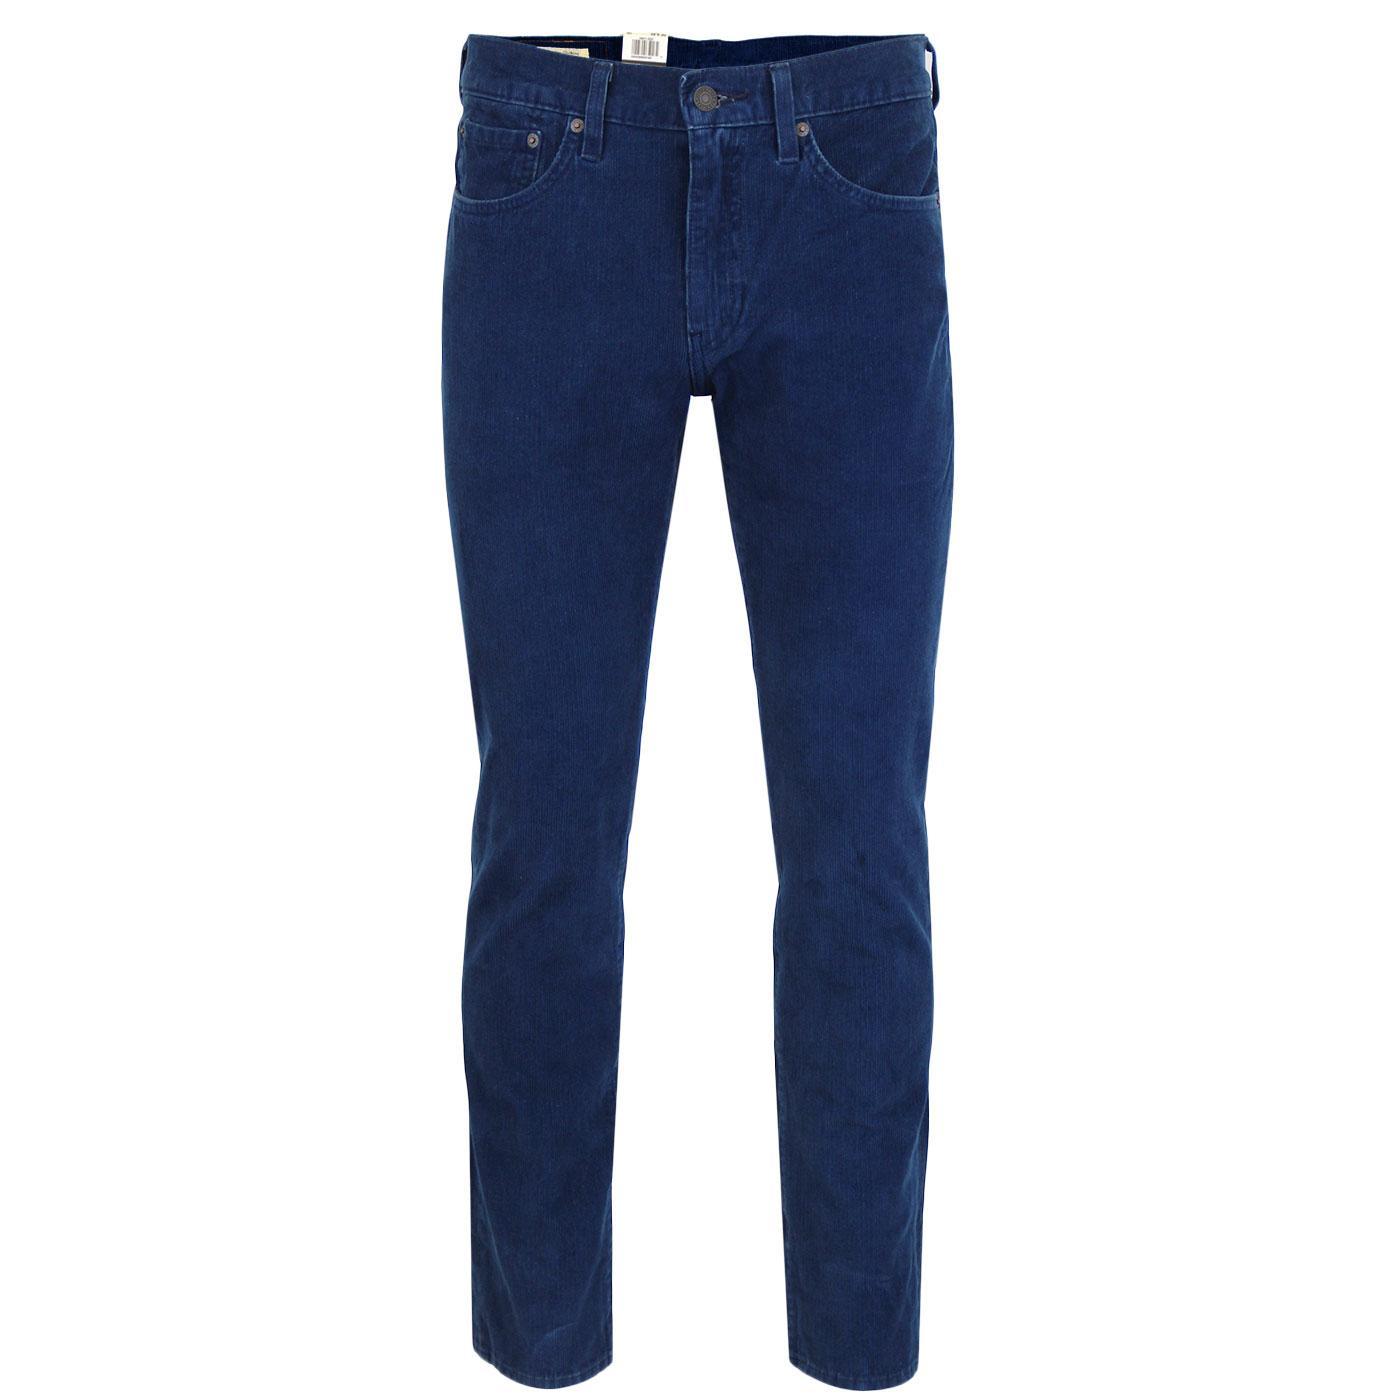 LEVI'S 511 Retro Mod Slim Cord Jeans (Indigo Mid)